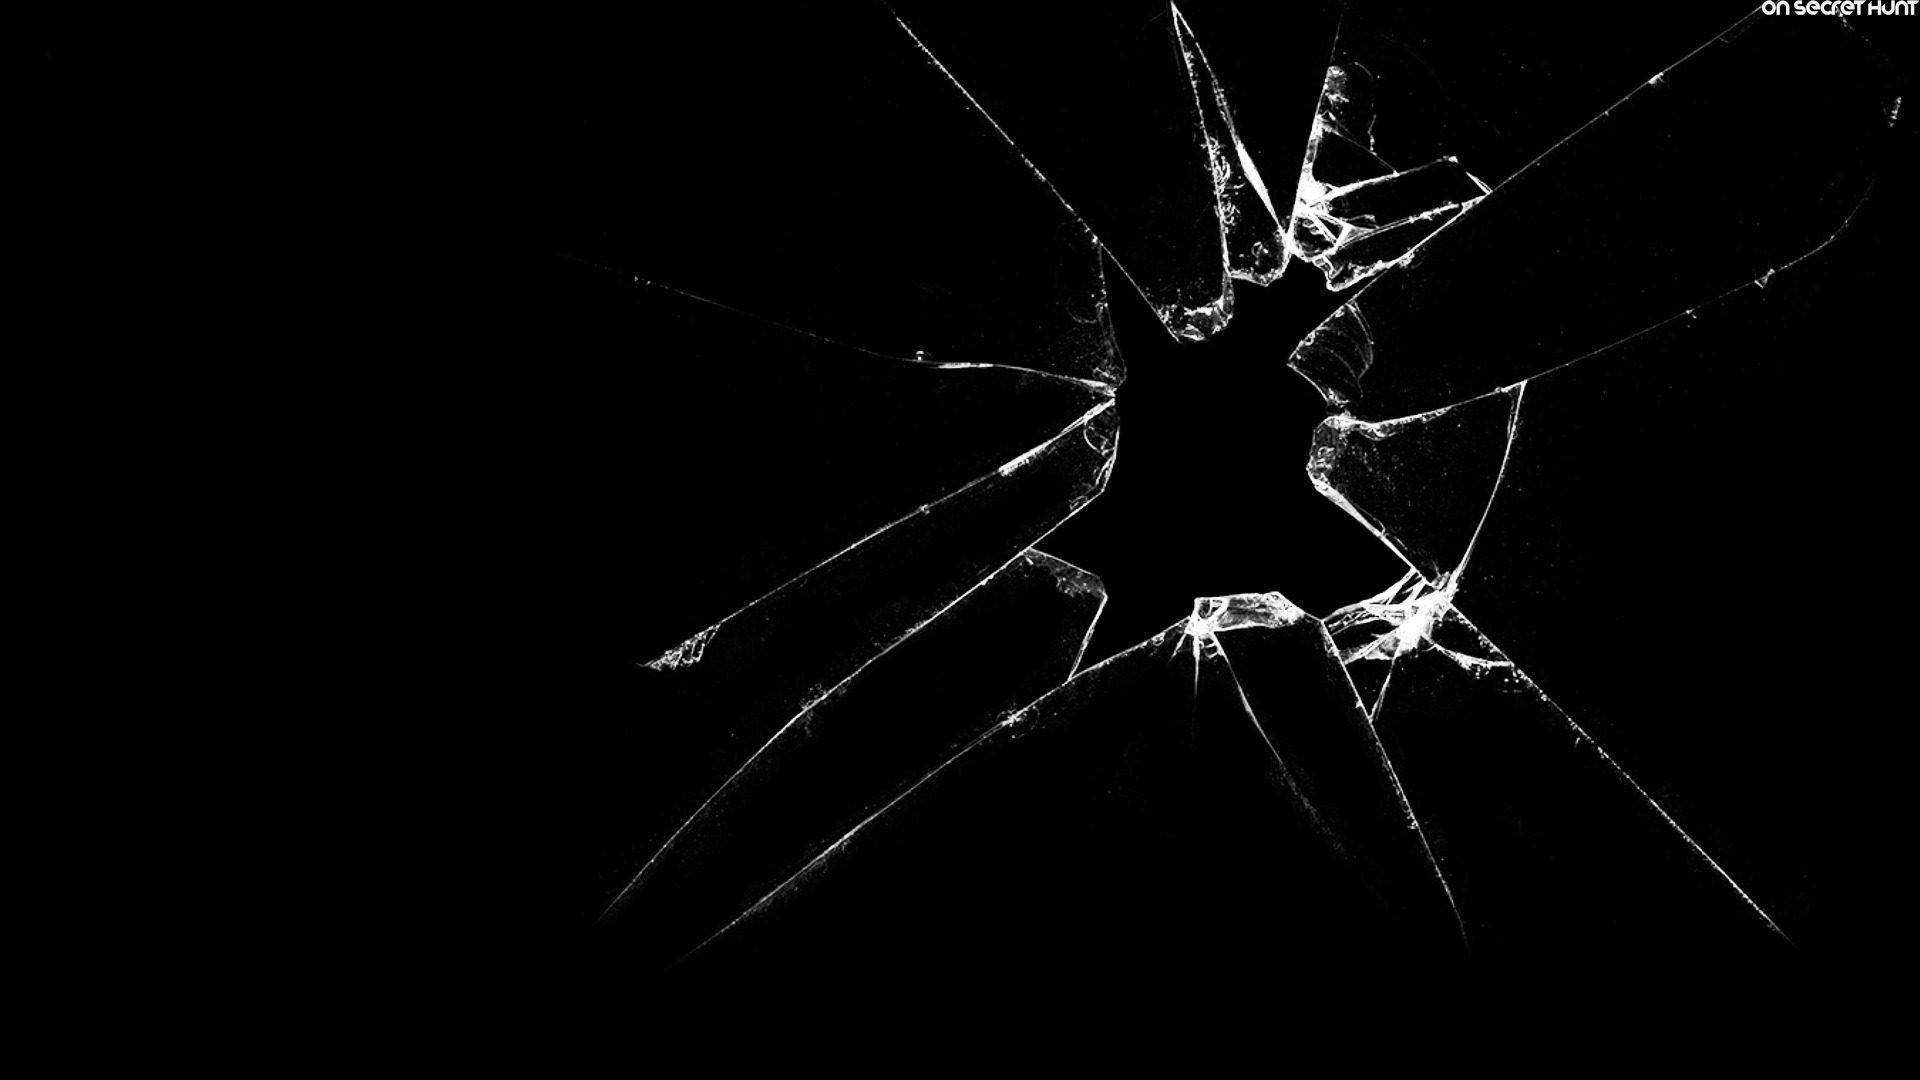 Broken Glass Wallpapers Hd Free Download > SubWallpaper